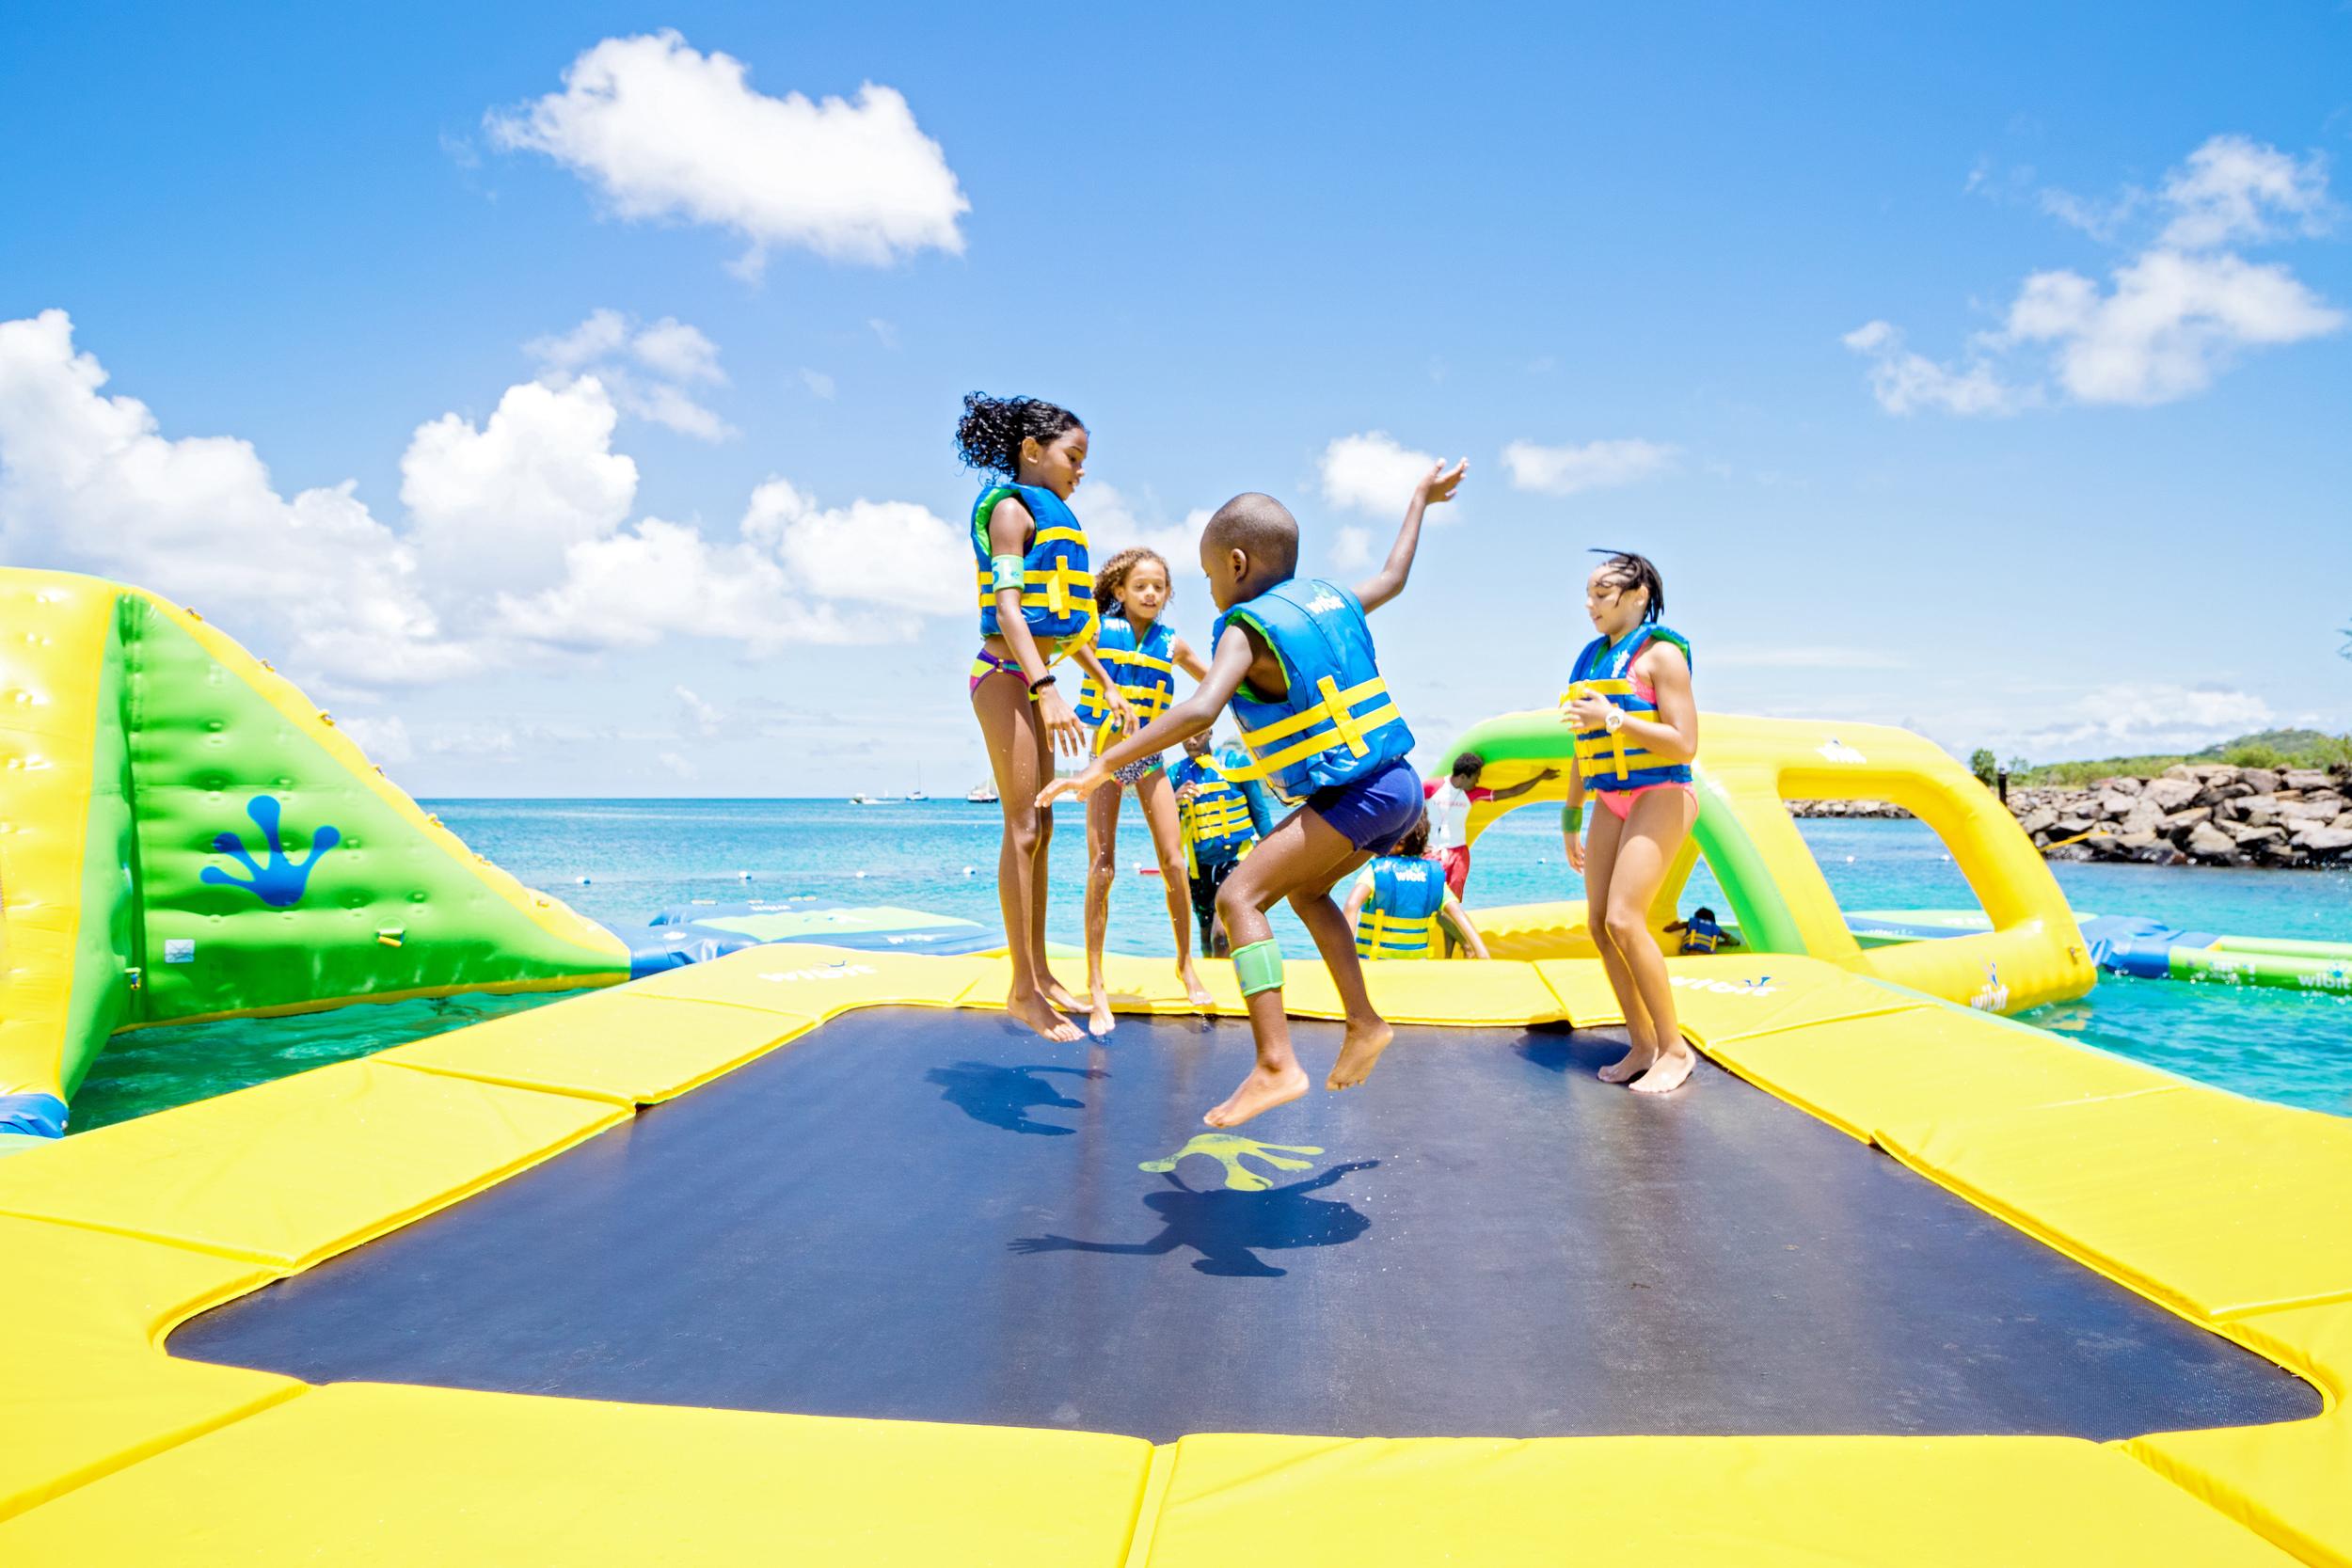 Trampoline at Splash Island Water Park St. Lucia Rodney Bay